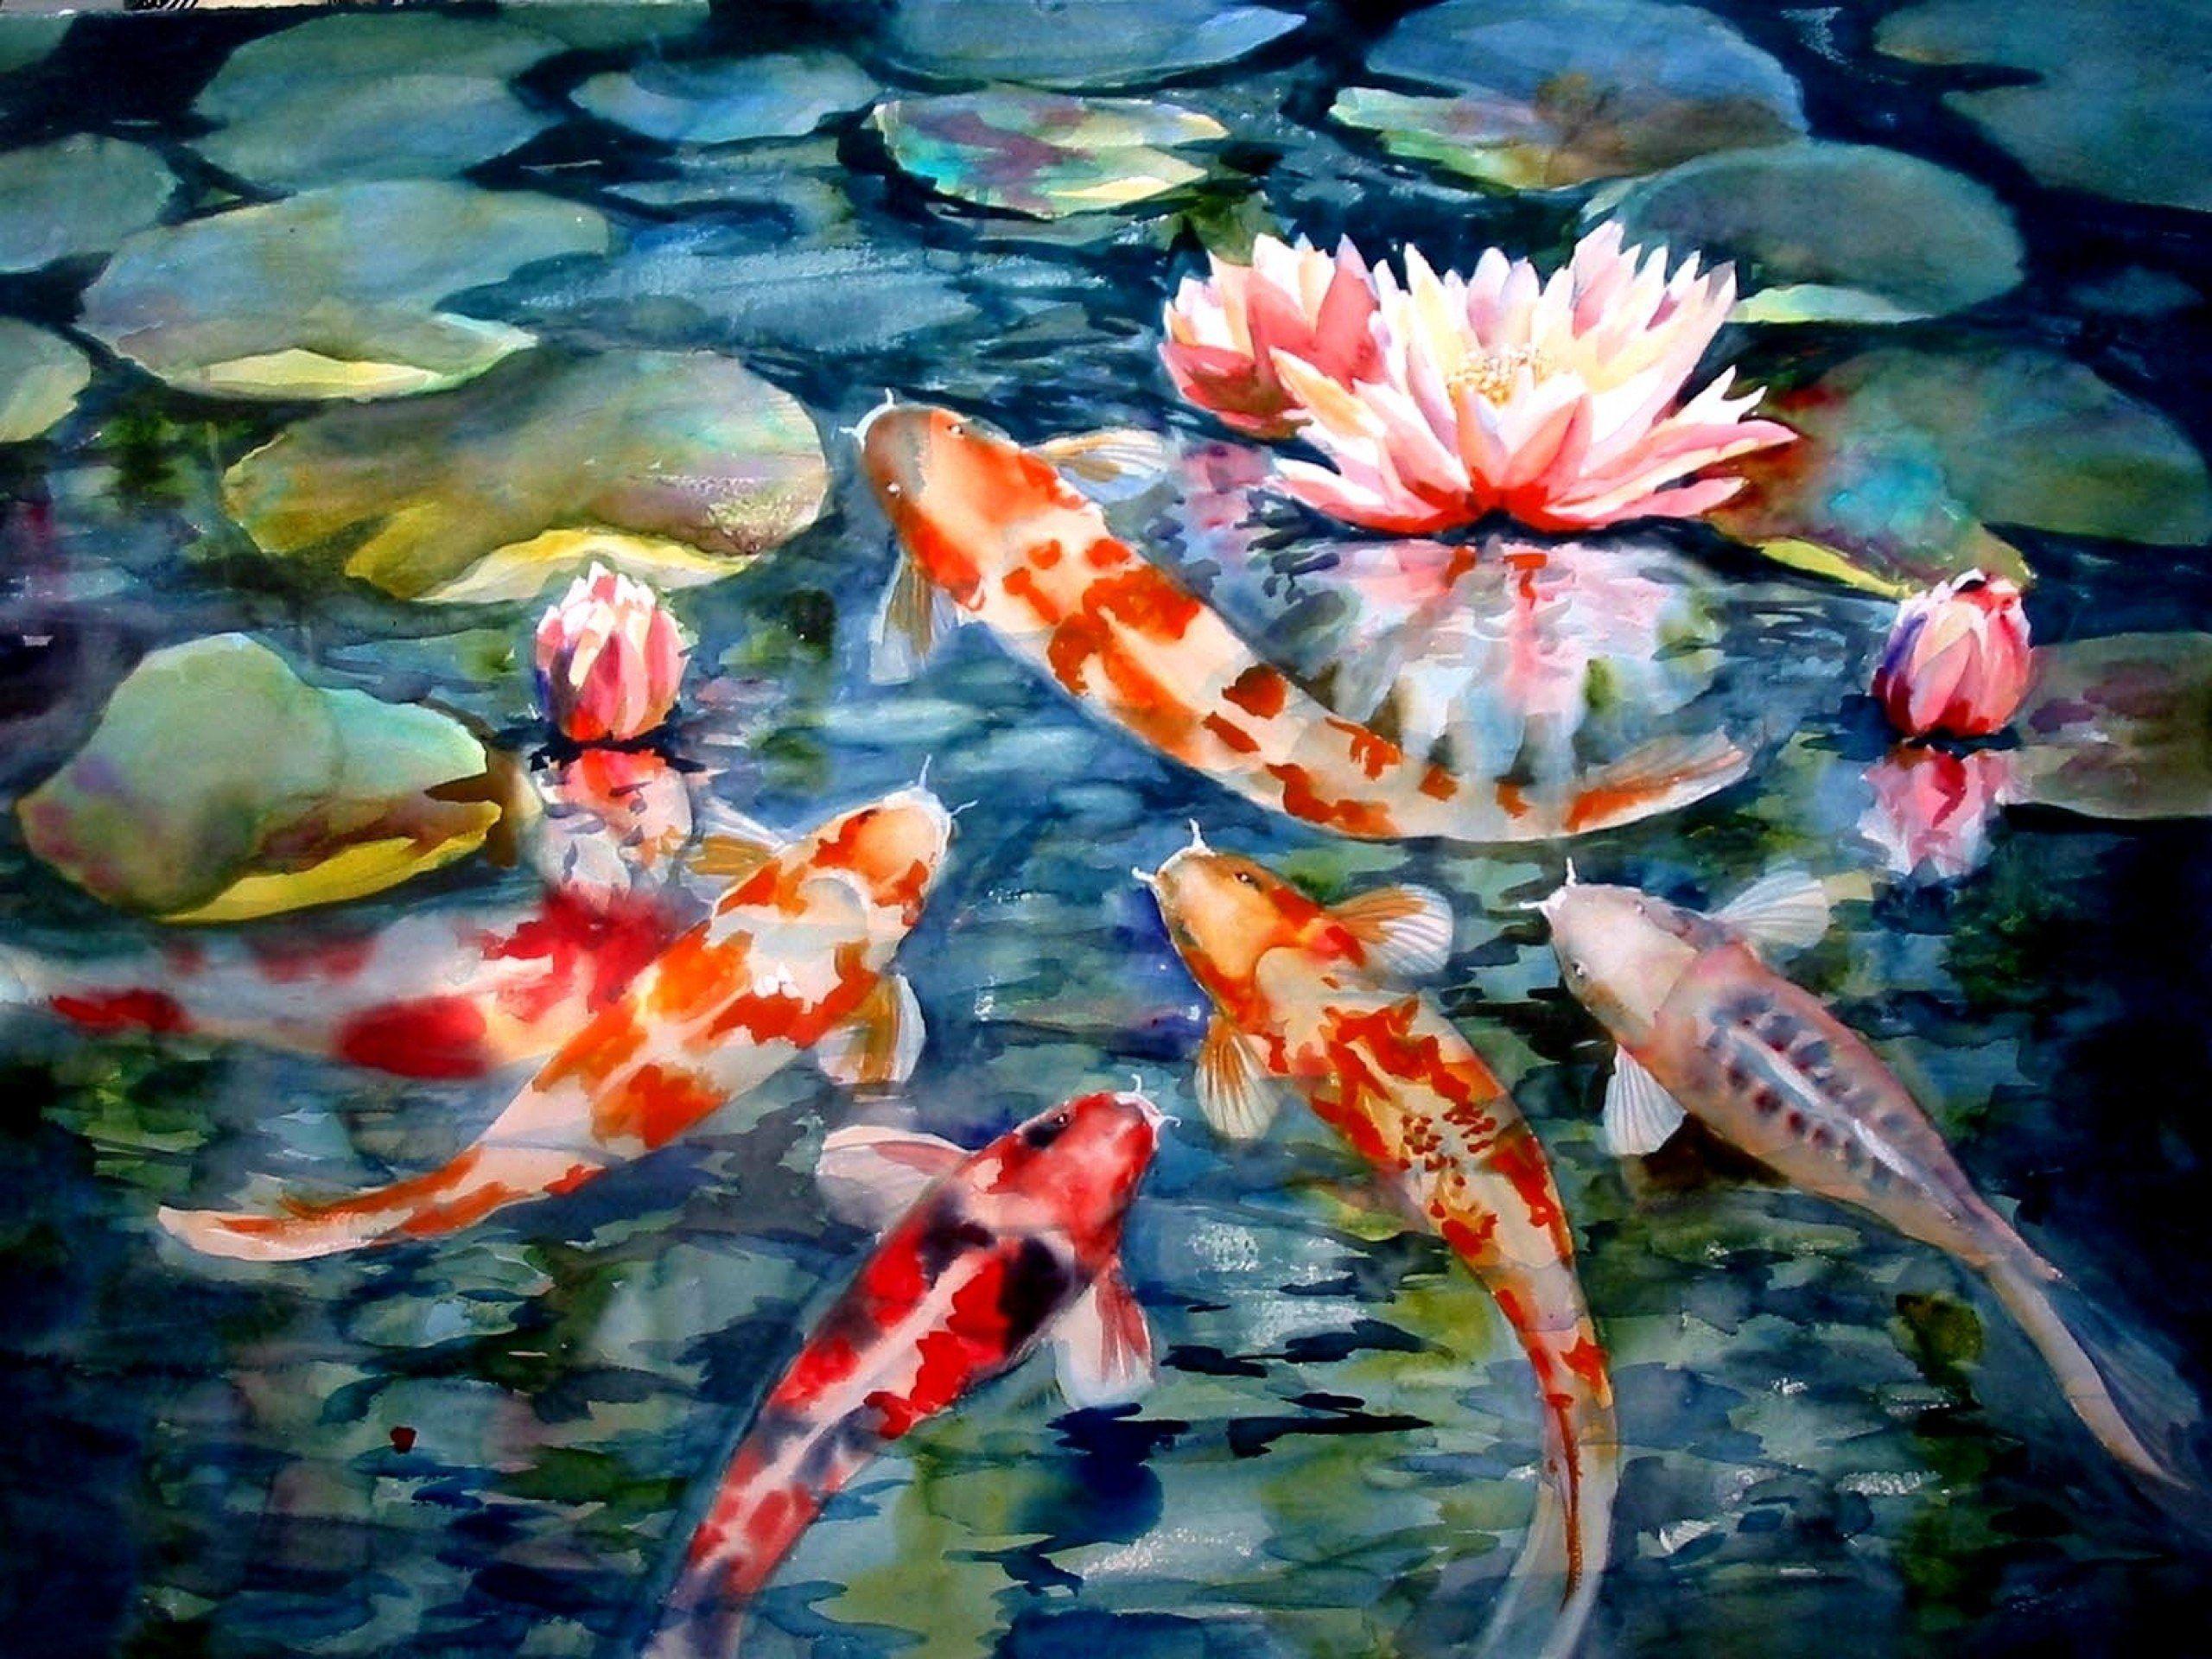 Koi Fish Art Wallpapers - Top Free Koi Fish Art ...